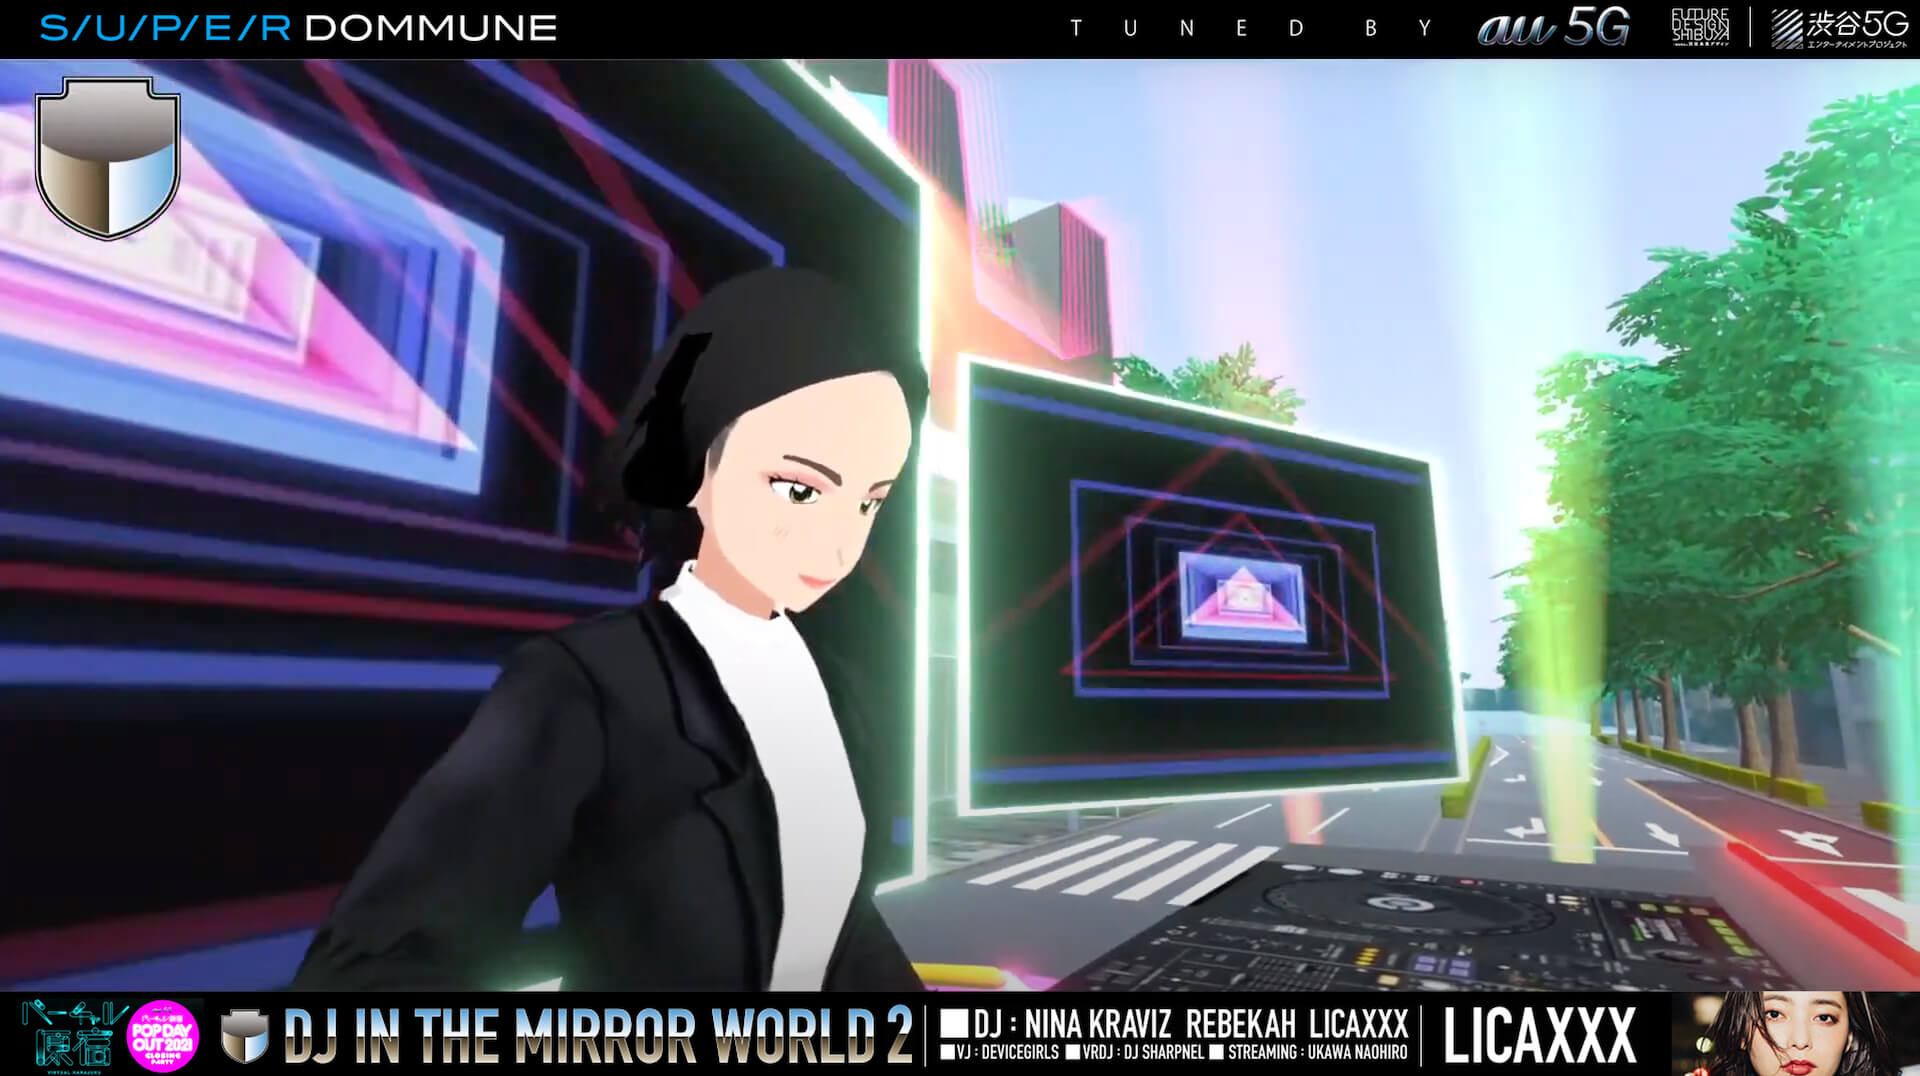 Nina Kraviz、Rebekah、Licaxxxが登場した<DJ IN THE MIRROR WORLD VOL.2>DJイベントのフル尺映像がアーカイブとして公開中! music210603_virtualharajuku_2